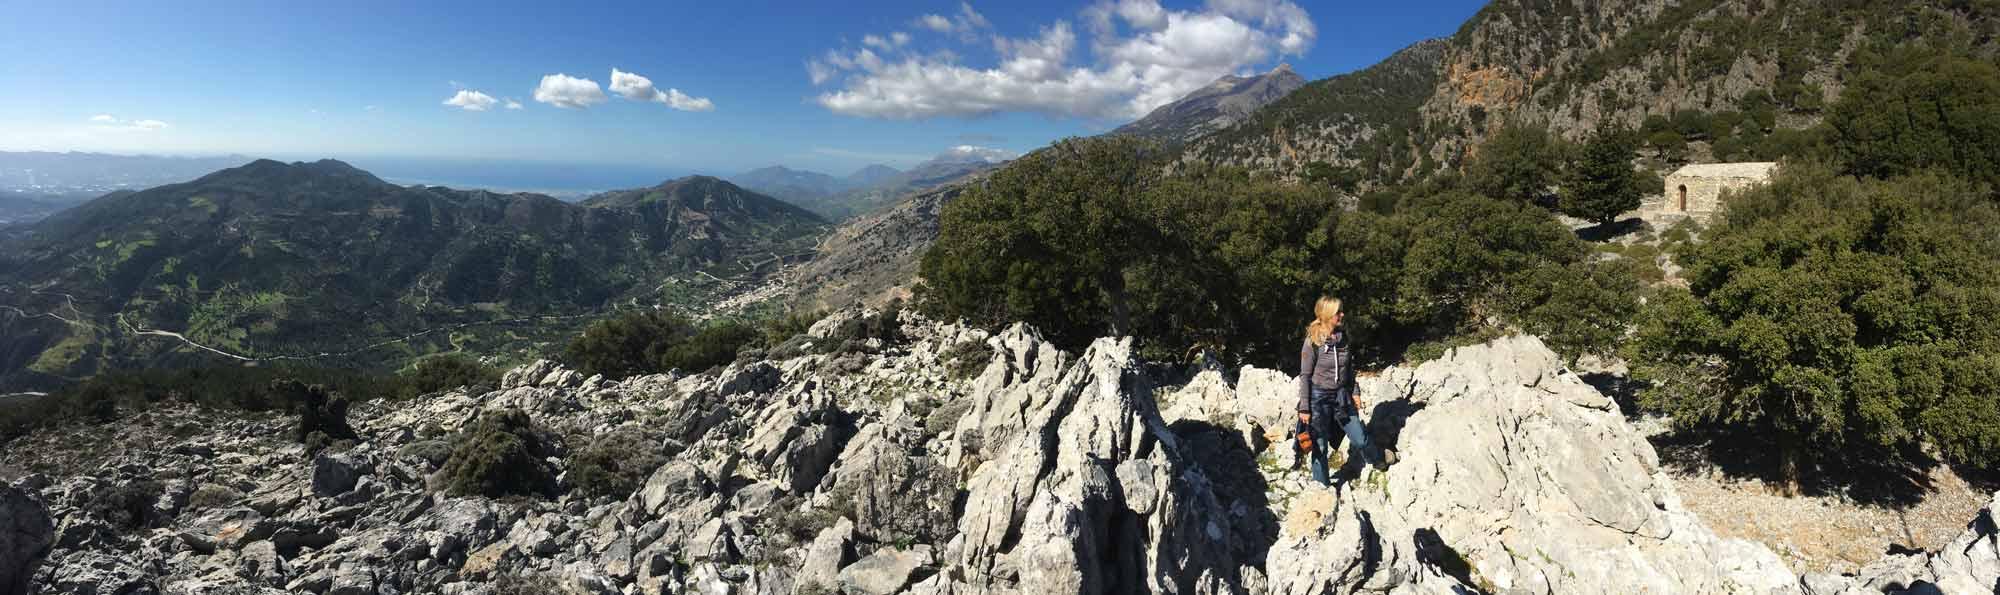 Kreta Inside - Heike